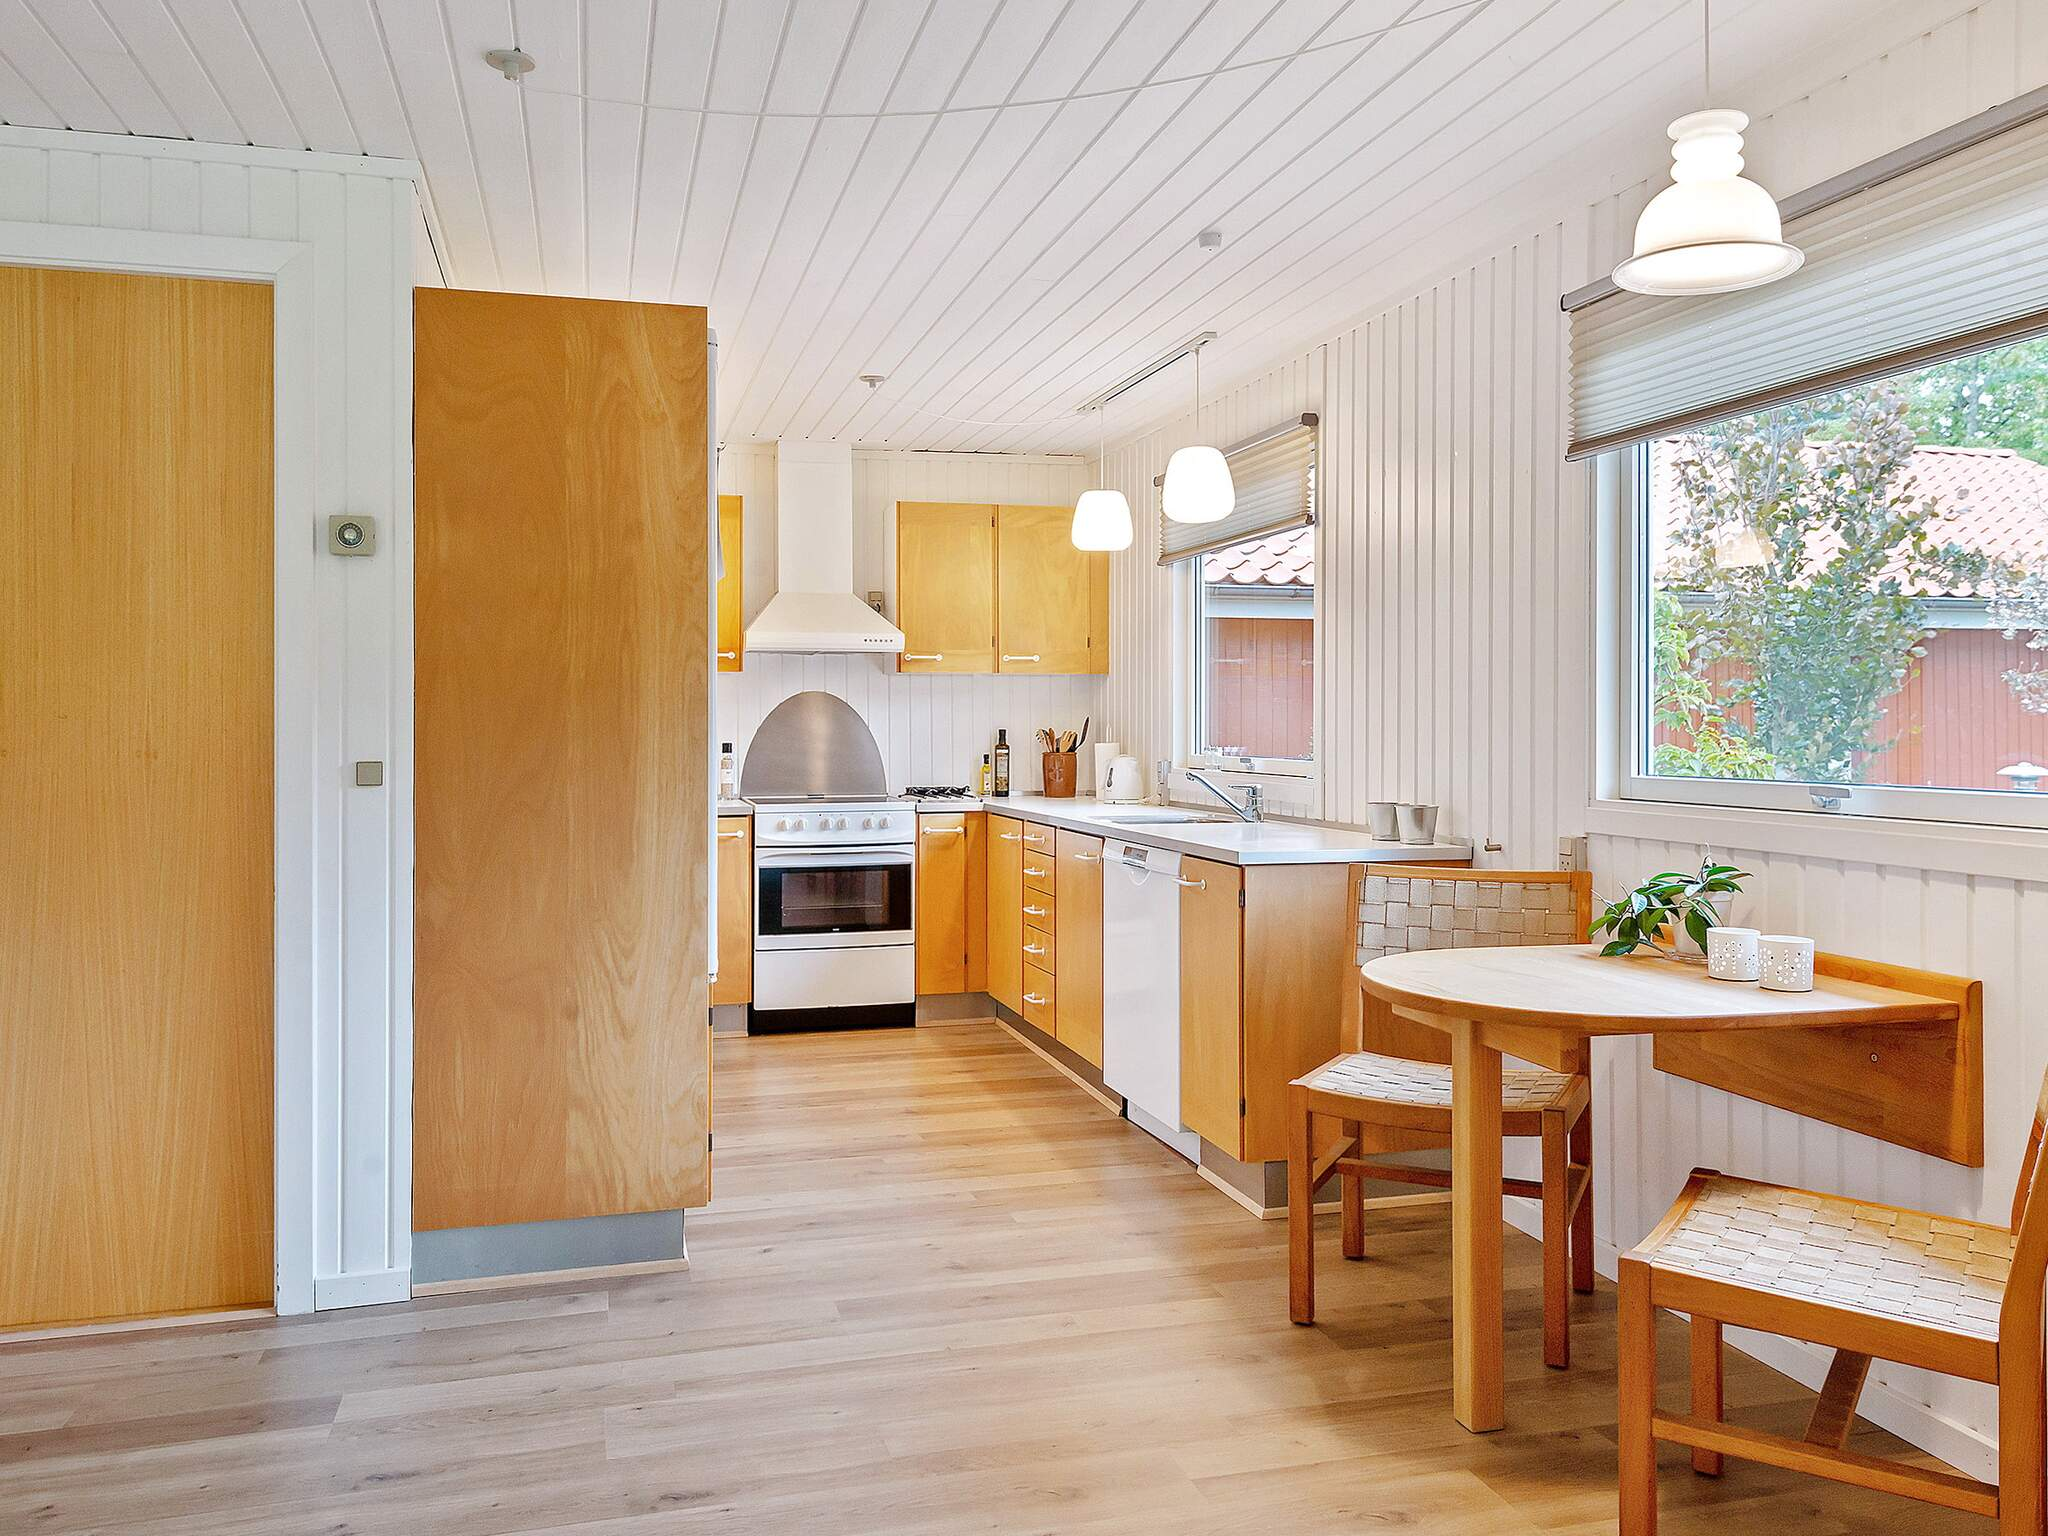 Ferienhaus Virksund (2561596), Virksund, , Limfjord, Dänemark, Bild 6